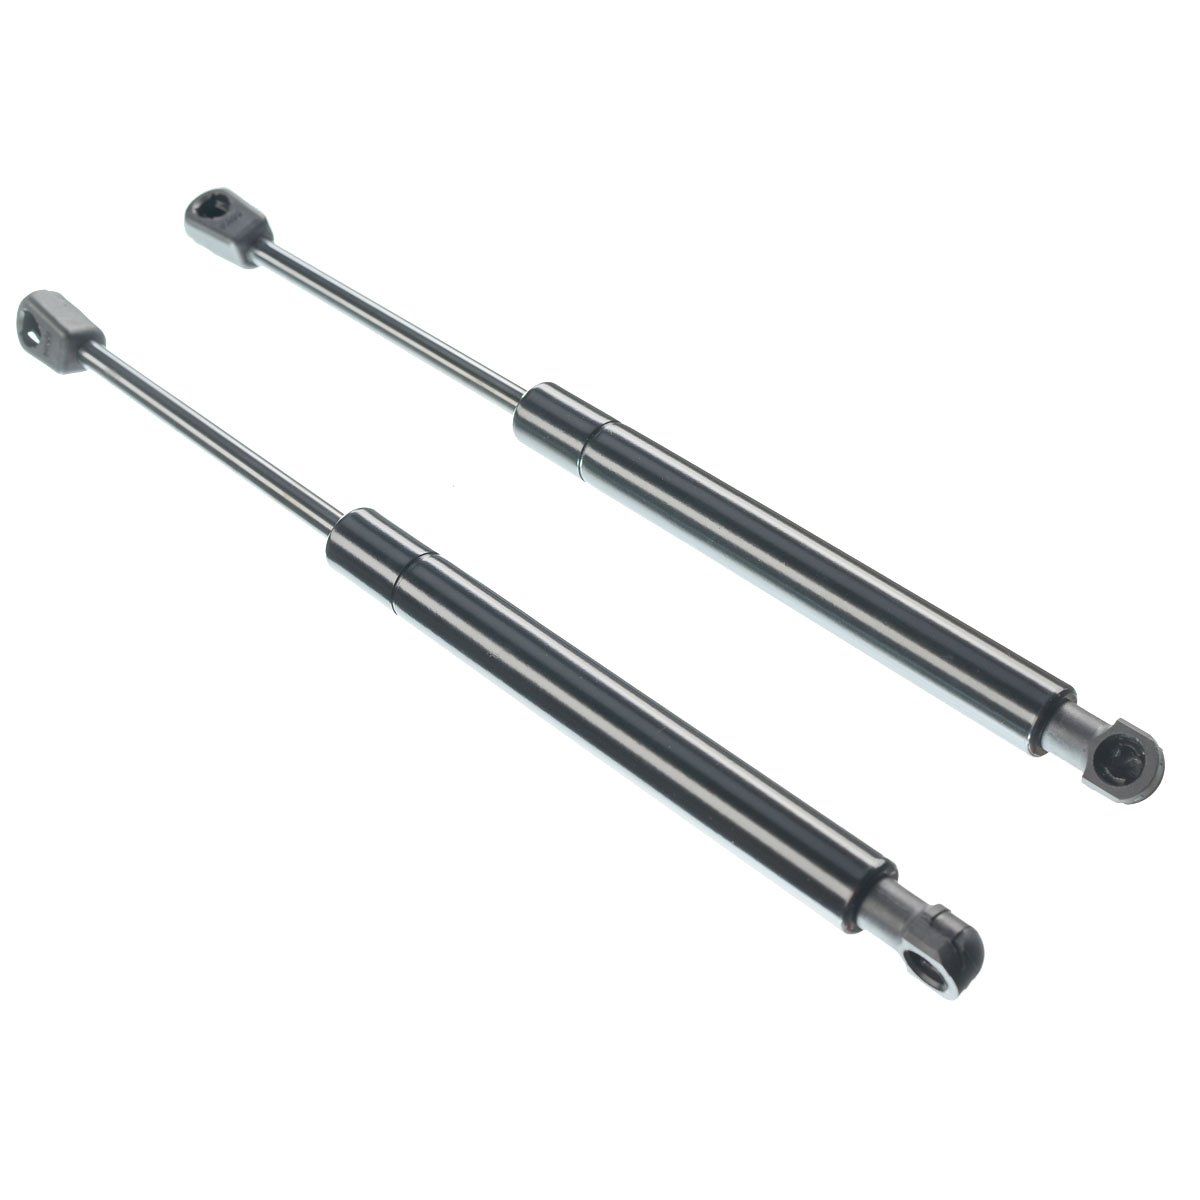 Rear Trunk Liftgate Lift Support Struts Gas Springs for Hyundai Sonata 2008-2012 Sedan Set of 2 YTAUTOPARTS